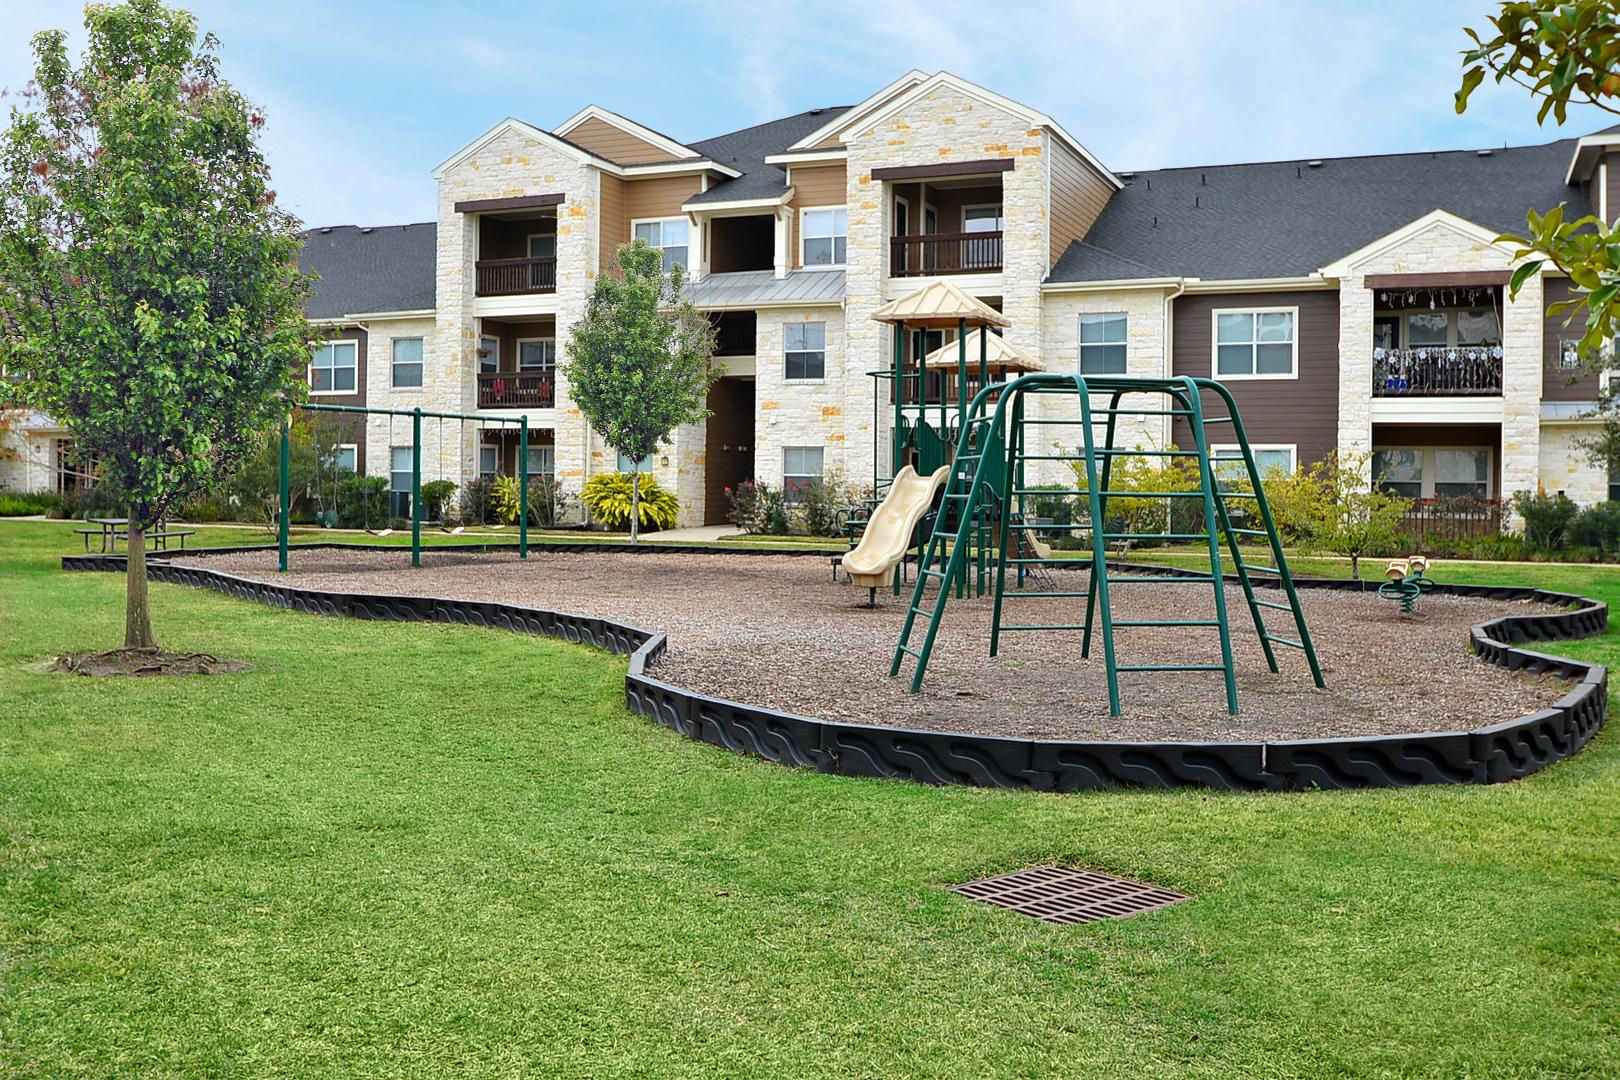 Oak Park Trails Apartments In Katy Tx In Katy Tx 77450